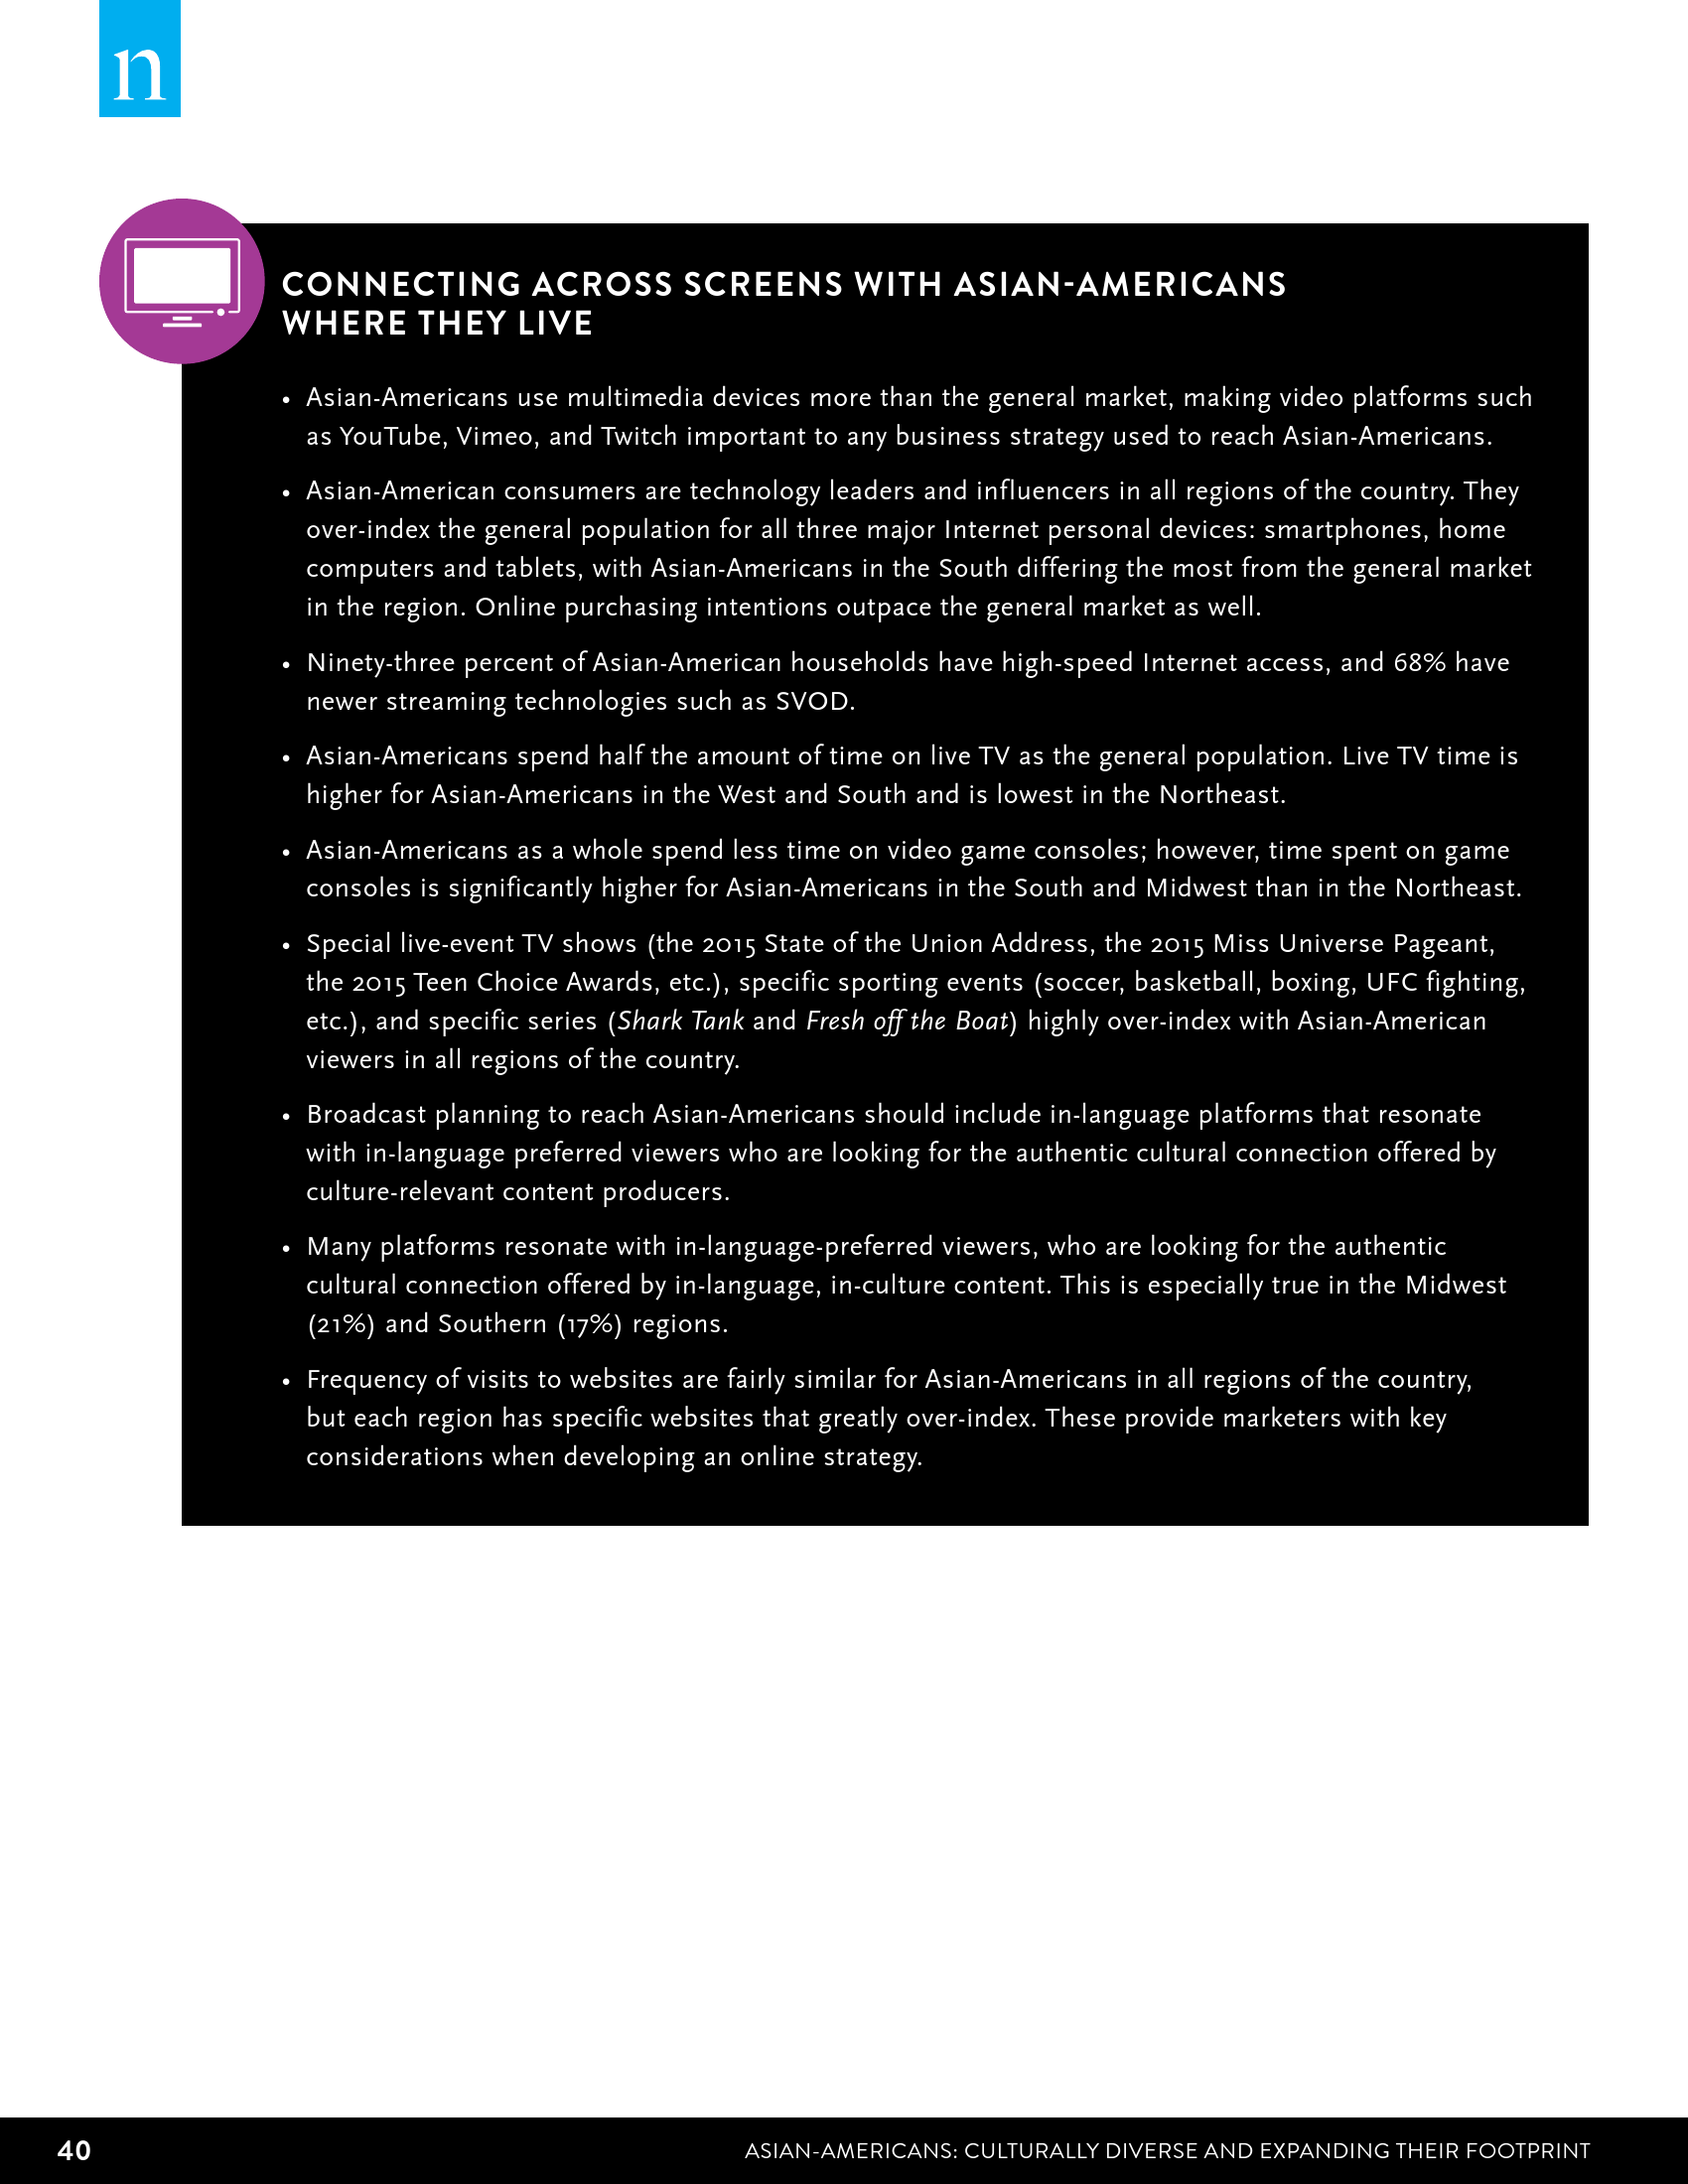 Nielsen:2016年美国亚裔消费者调查报告_000040